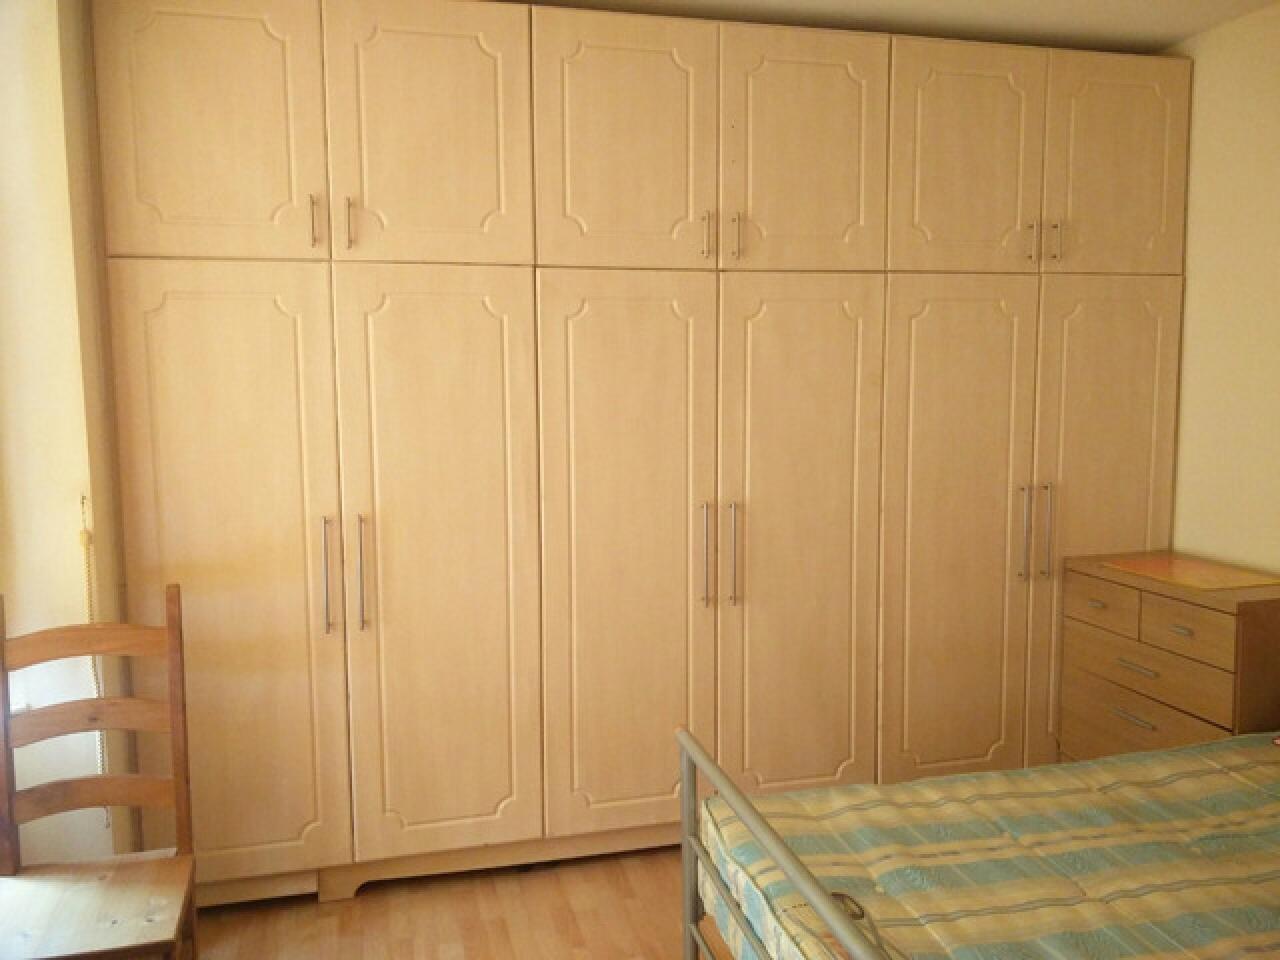 Сдаю Double Room Hounslow central - Hounslow East - 2